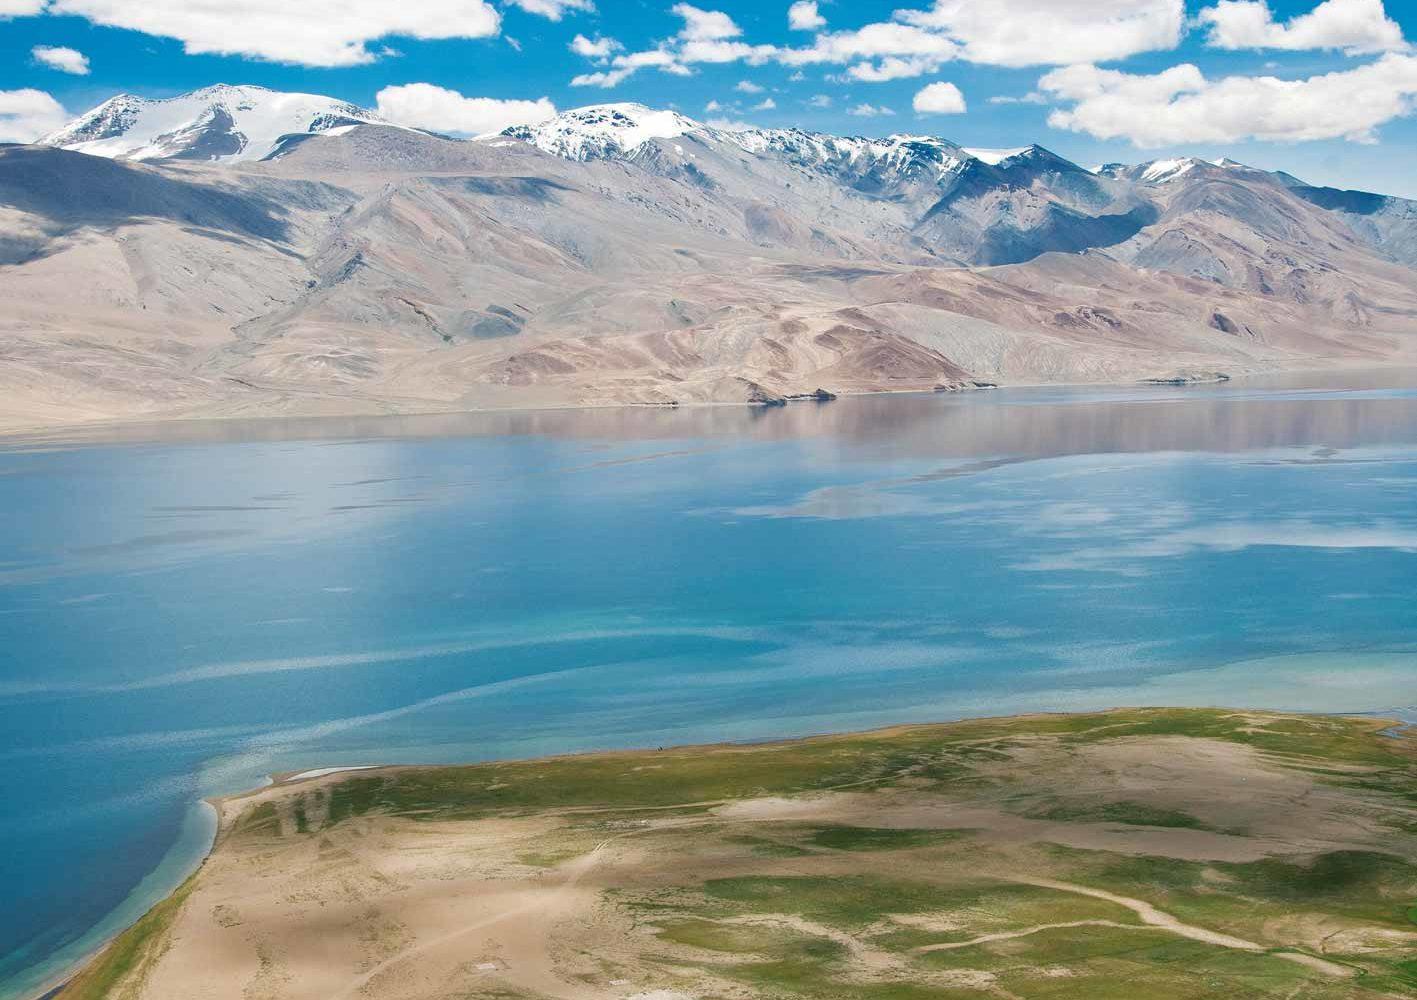 Wunderschöner Tso Moriri-See in Ladakh